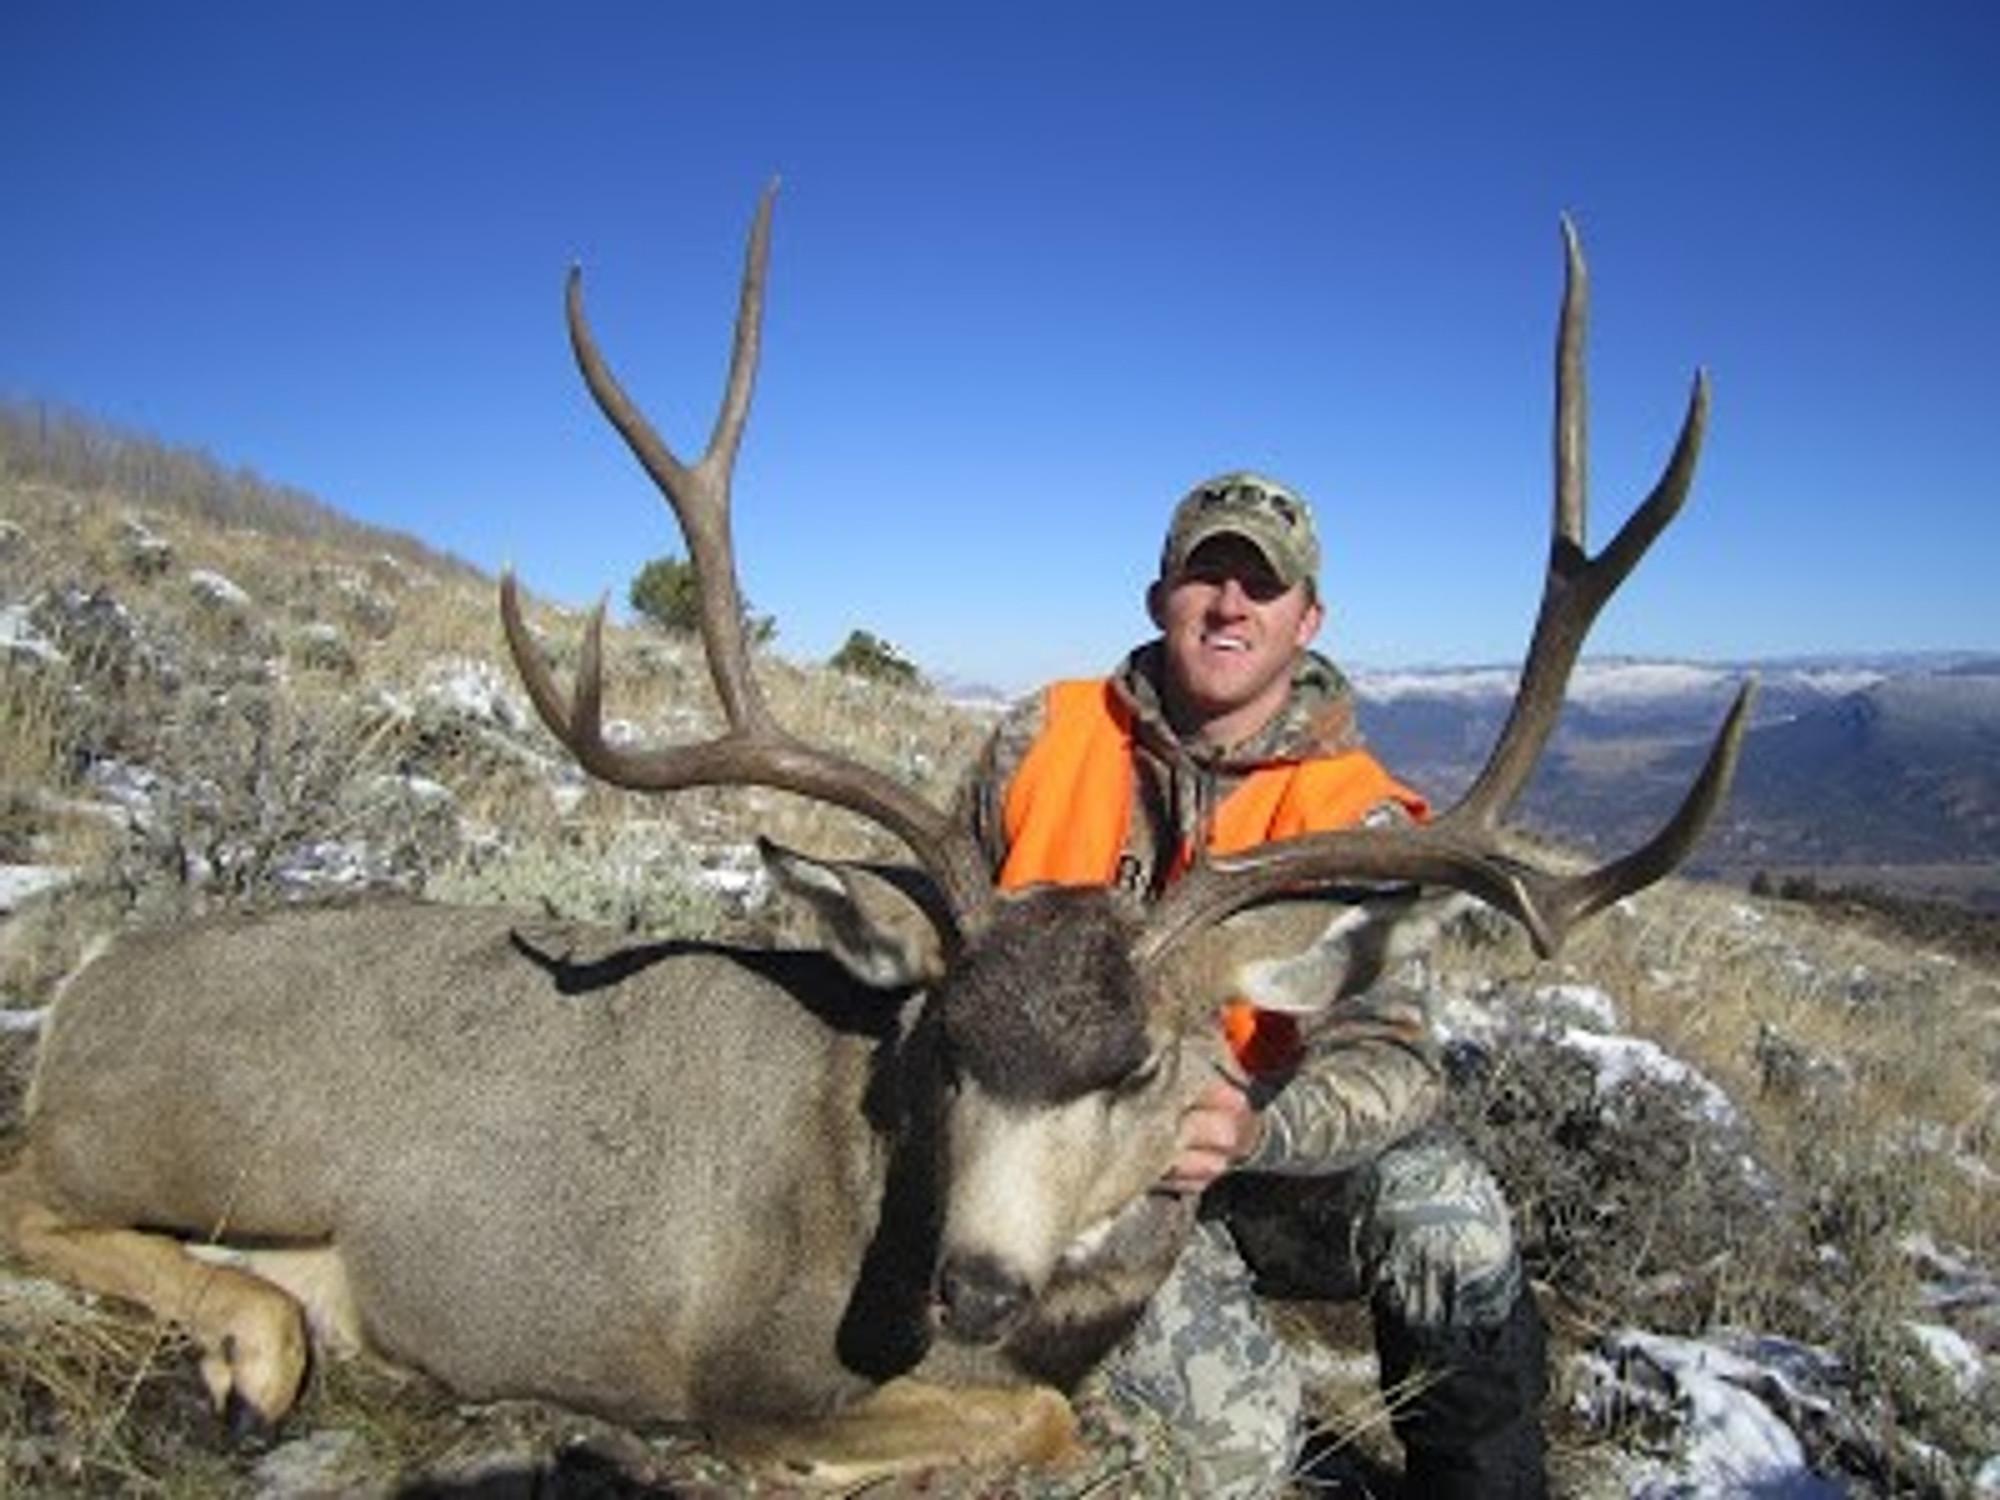 Hunt 9002 Diy Drop Camps Elk Deer Antelope Private Public